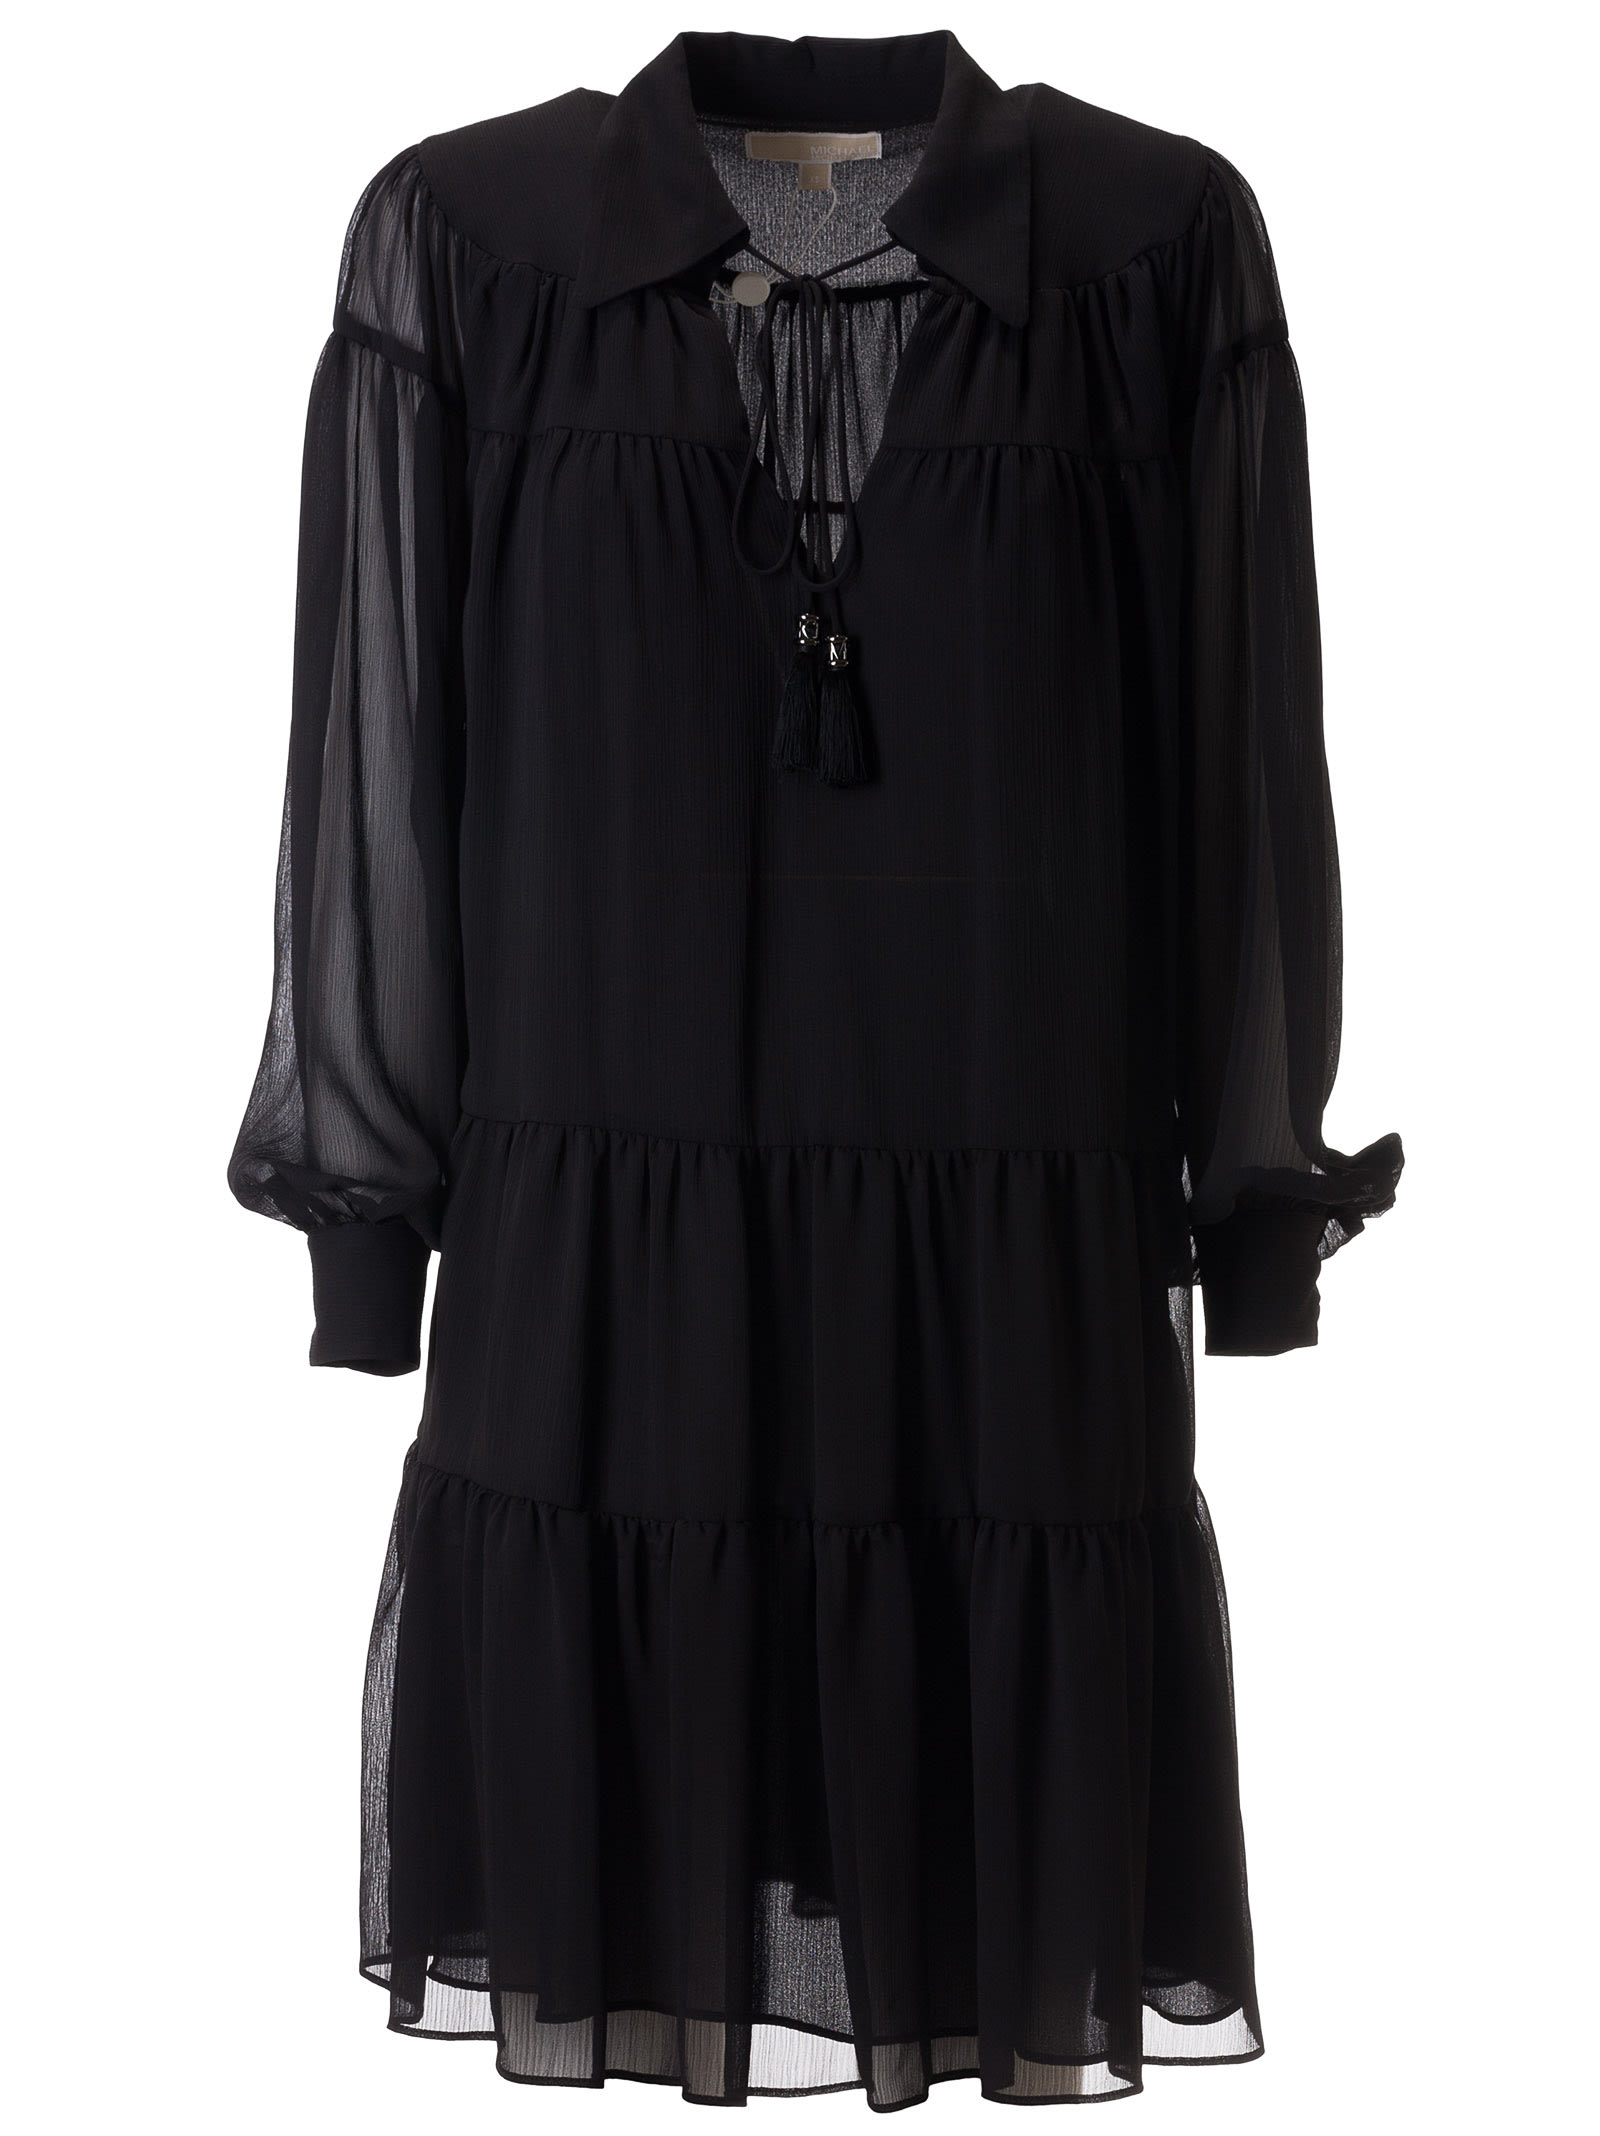 Michael Kors Lace Insert Dress